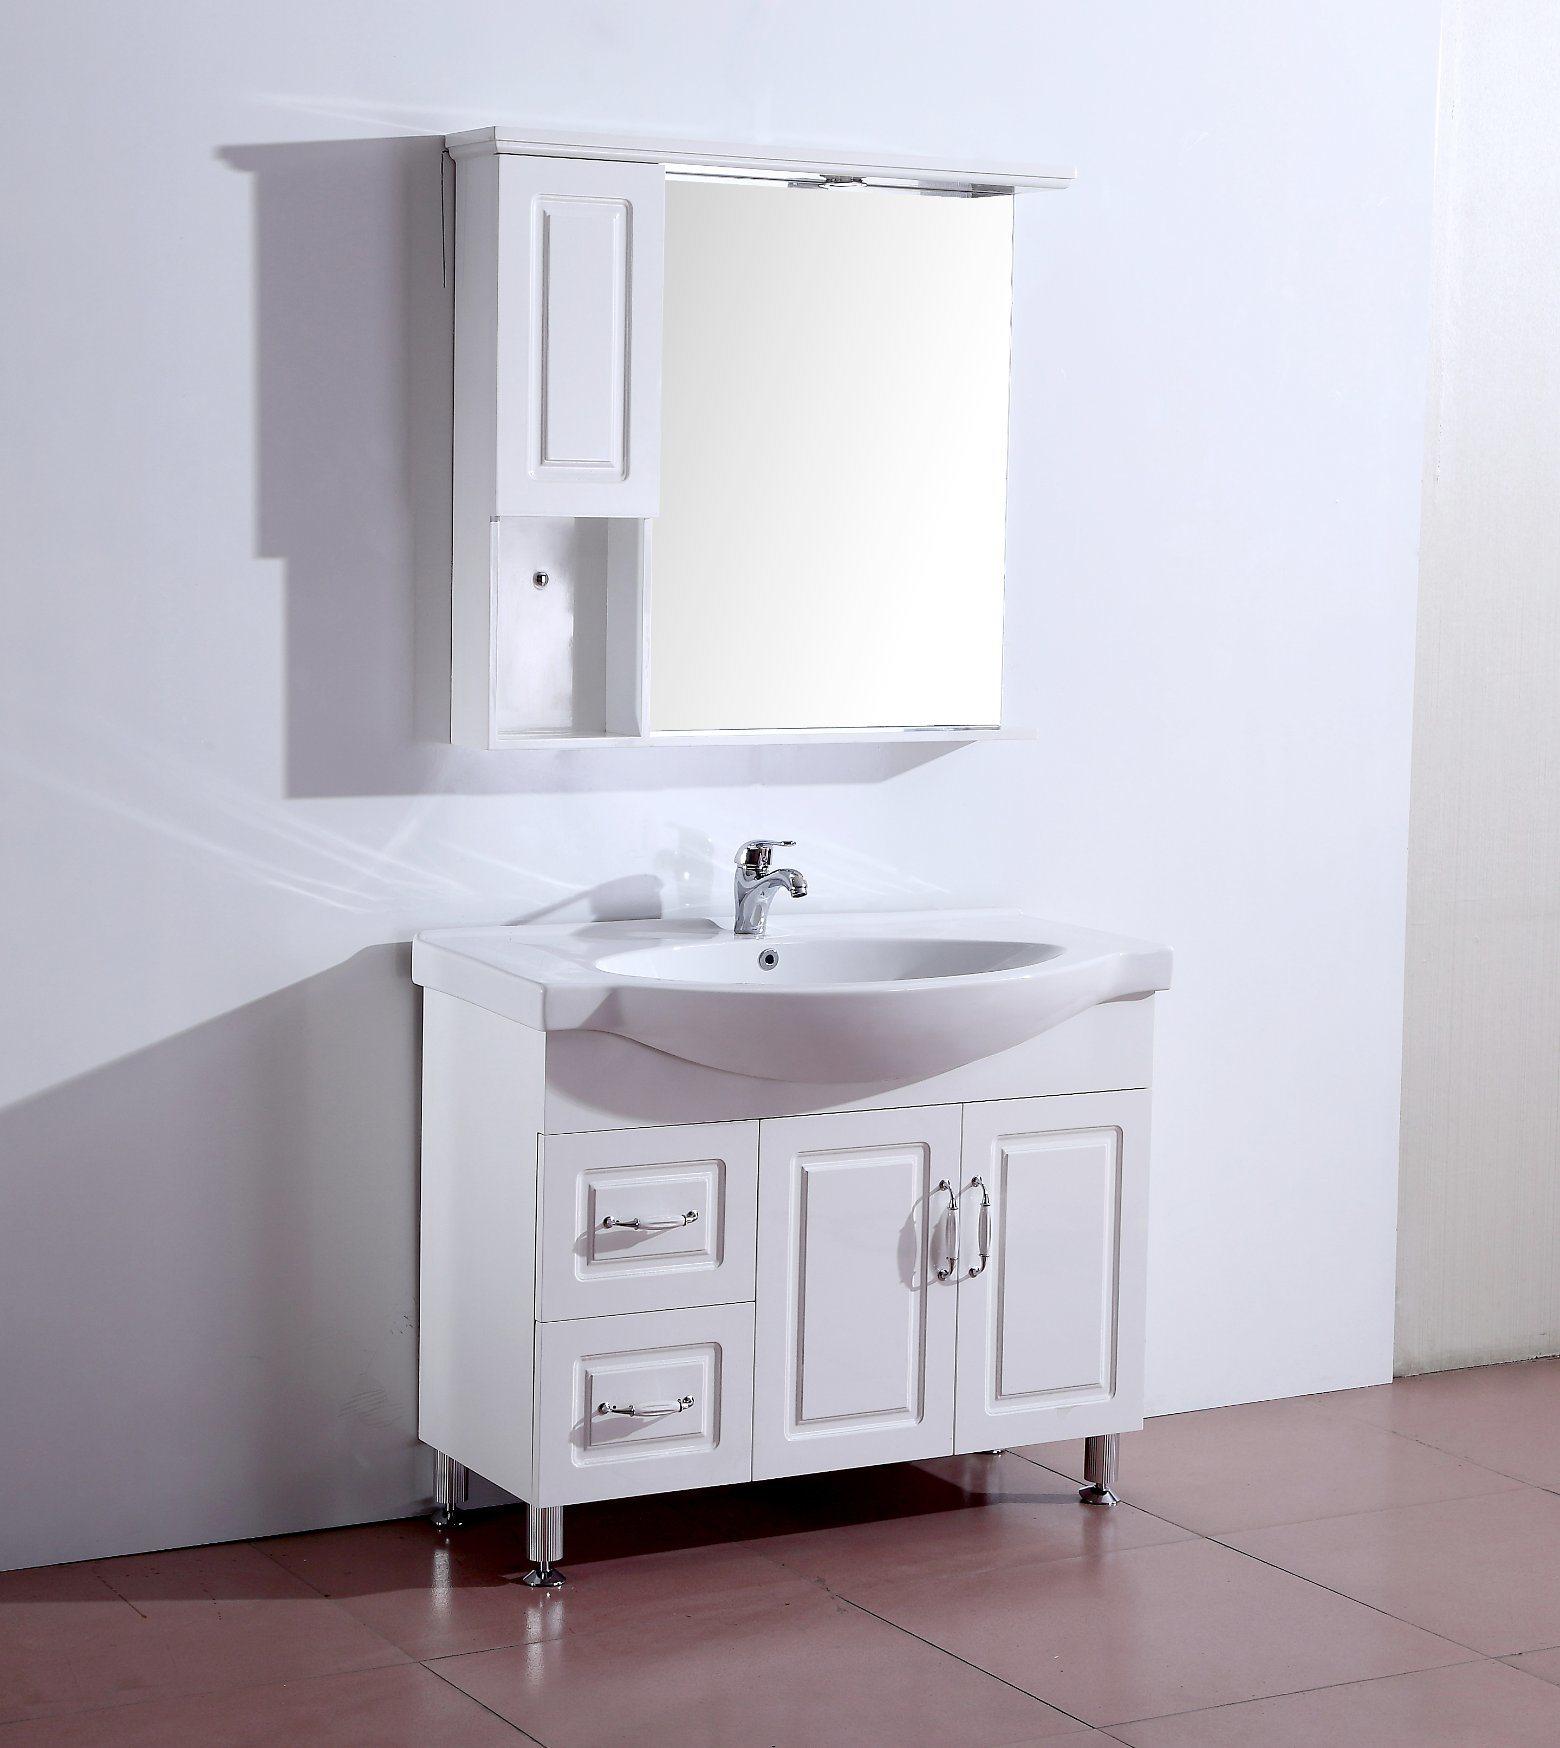 China Modern Single Sink Landing Waterproof Bathroom Storage Cabinets Bathroom Wc Shower Wash Basin Cabinet Ot1941 China Bathroom Cabinet Solid Wood